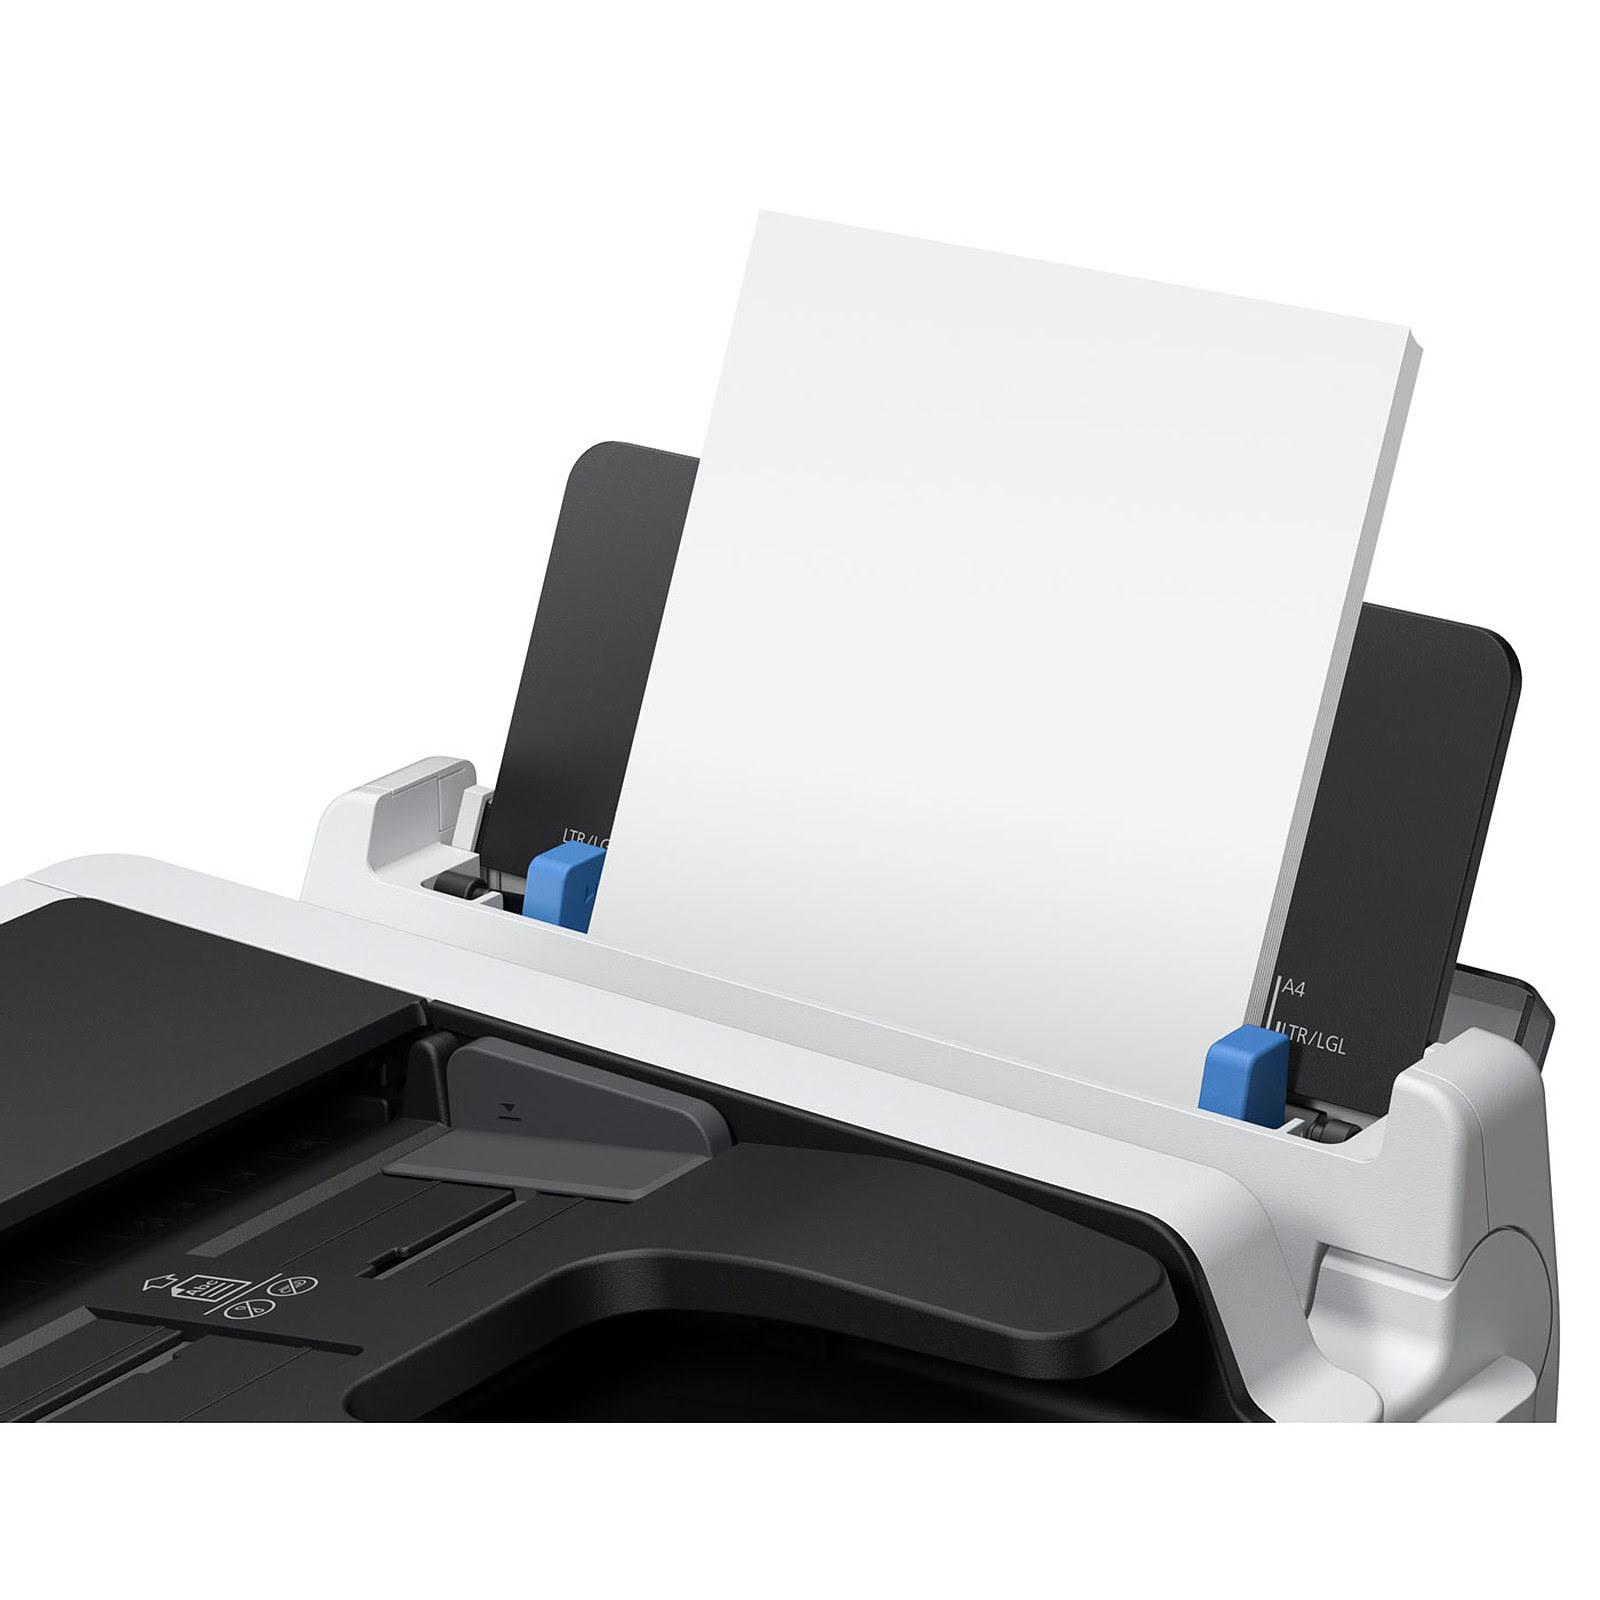 Imprimante multifonction Epson WorkForce Pro WF-C5790DWF - 1